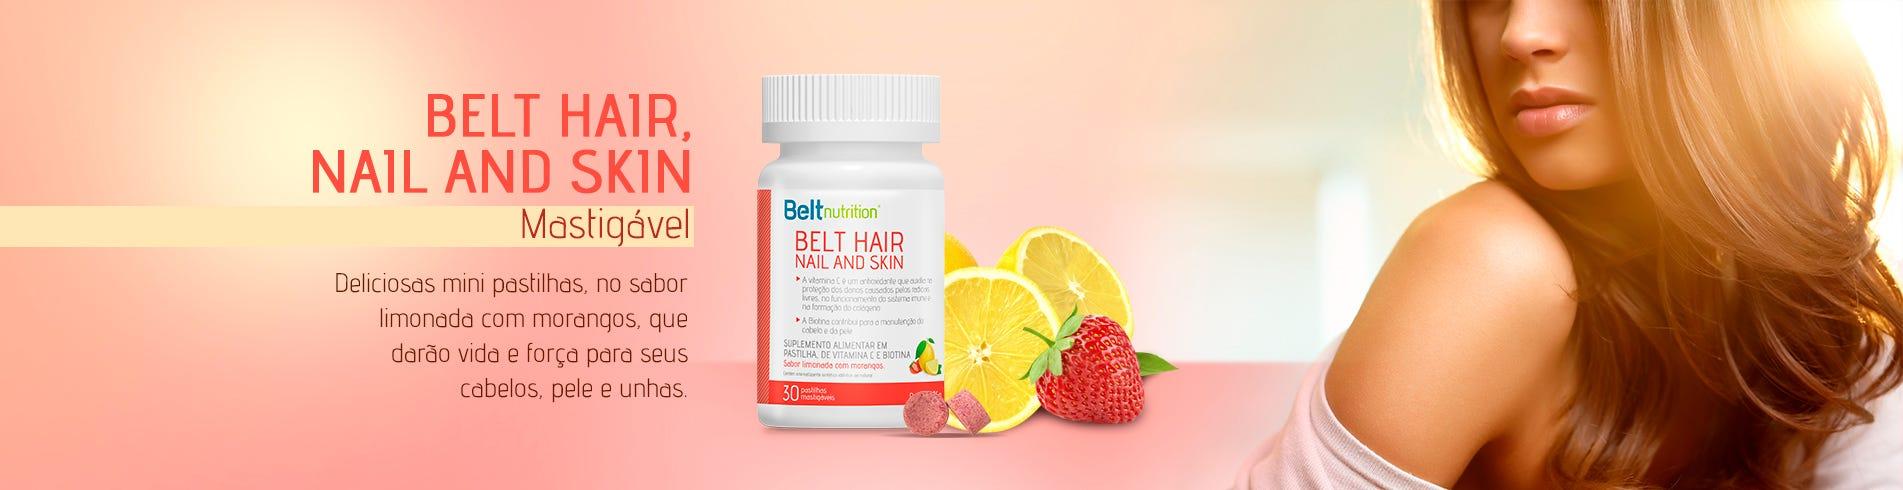 Hair, Nail ad Skin Limonada com Morangos